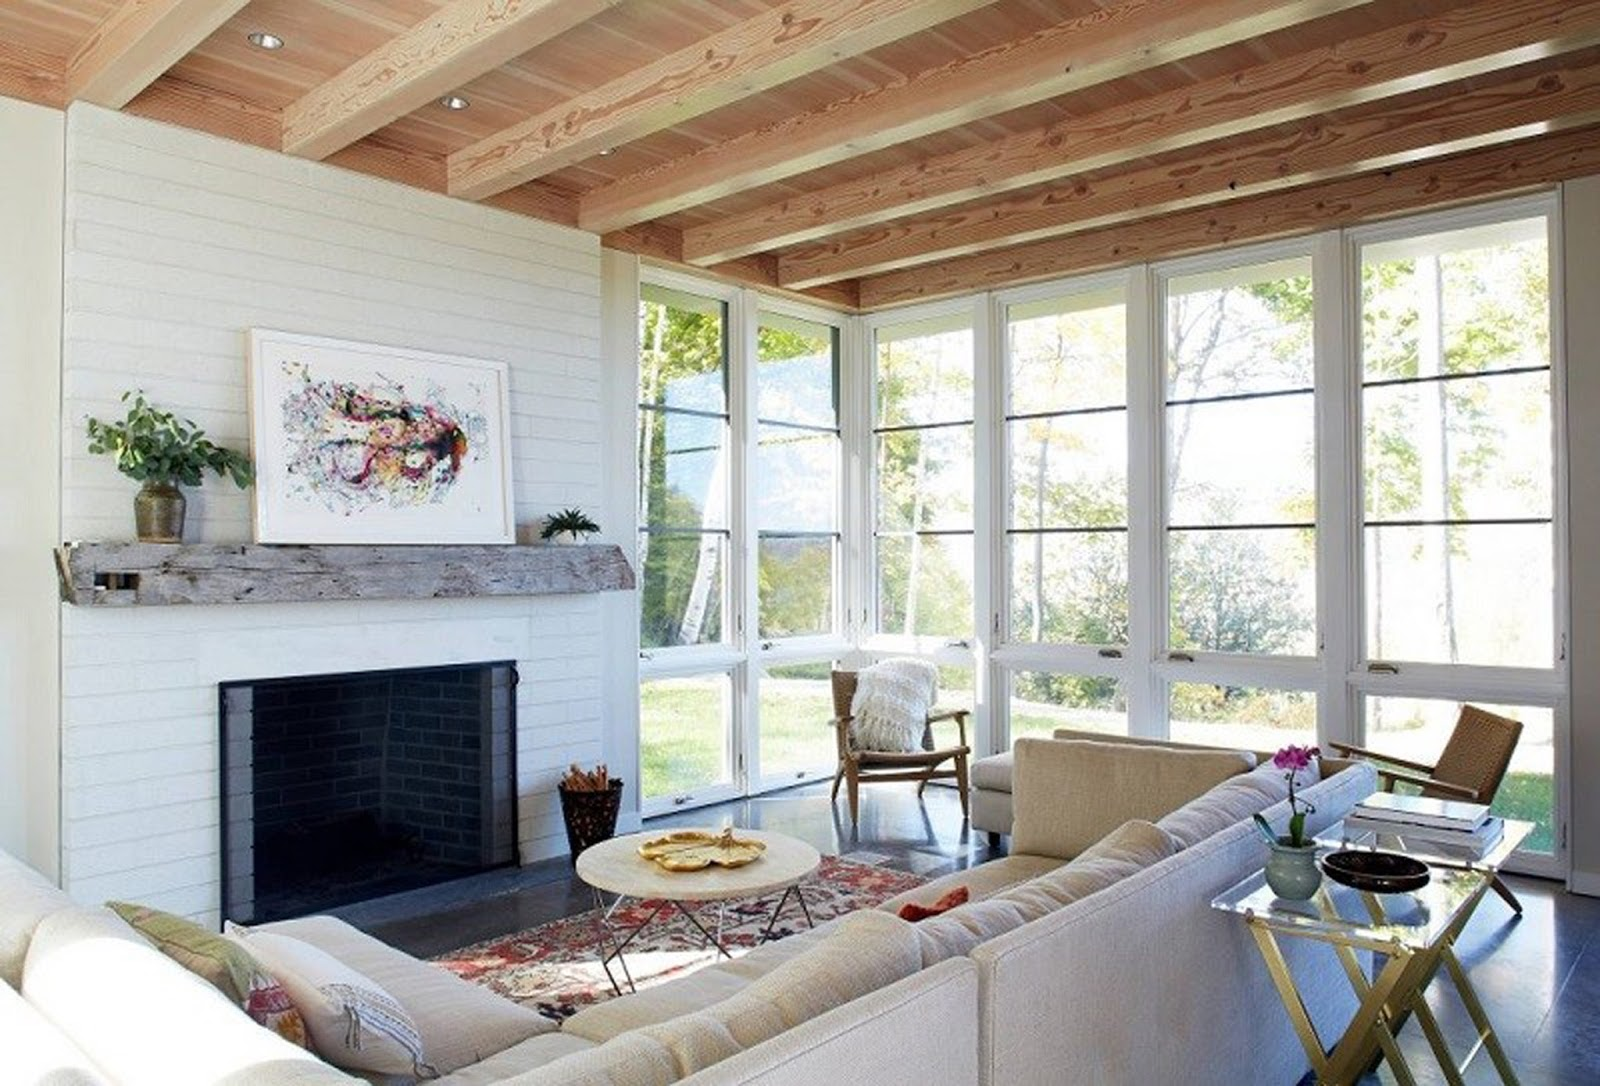 home designer interiors 2014 2. Home Designer Interiors home interior designs amazing designer interiors 24